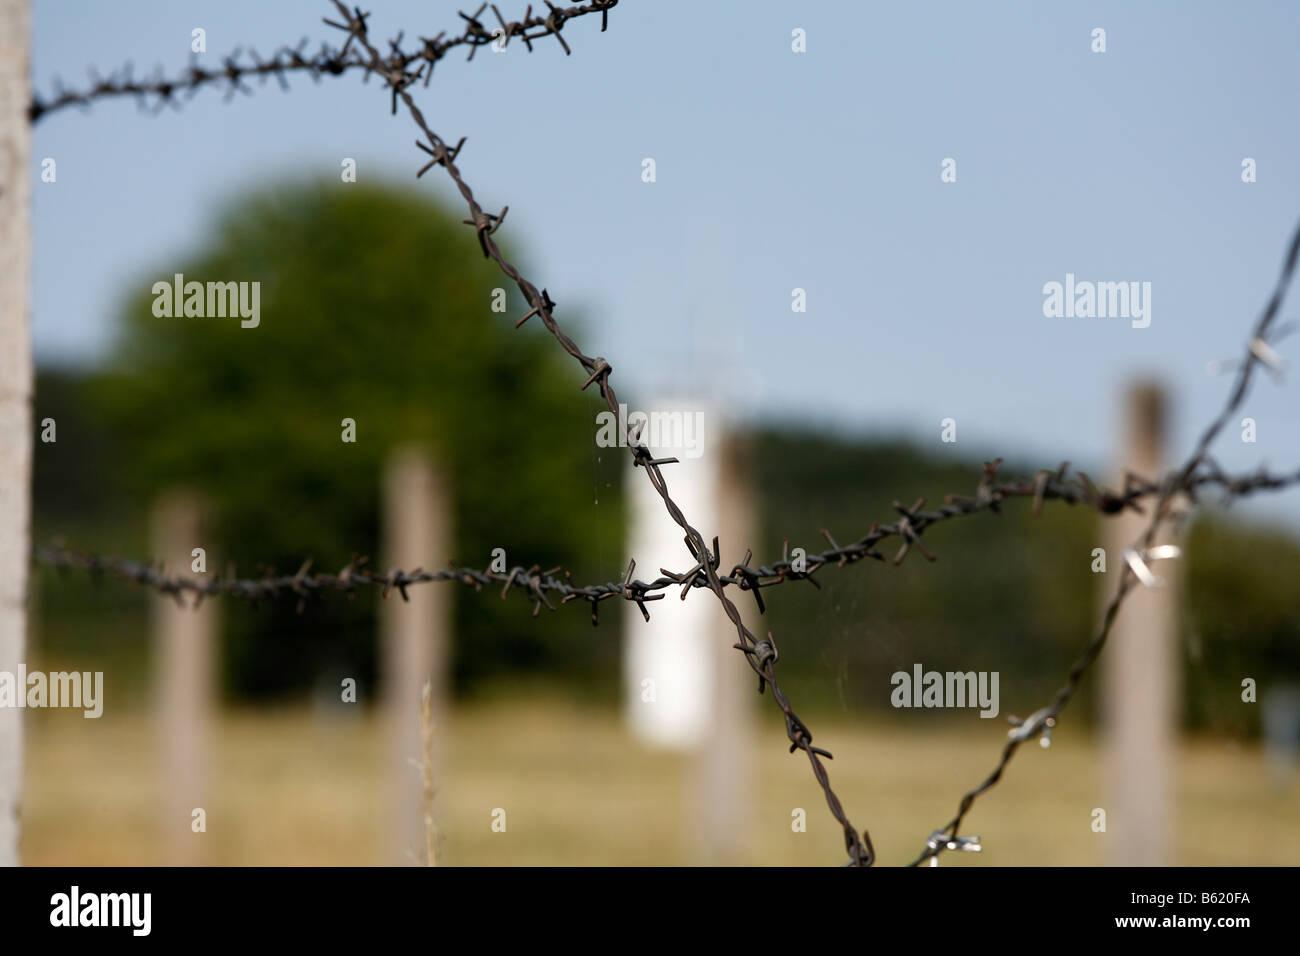 Former DDR/GDR border, Point Alpha Border Museum, Rasdorf/Geisa, Rhoen, Thuringia, Germany, Europe - Stock Image